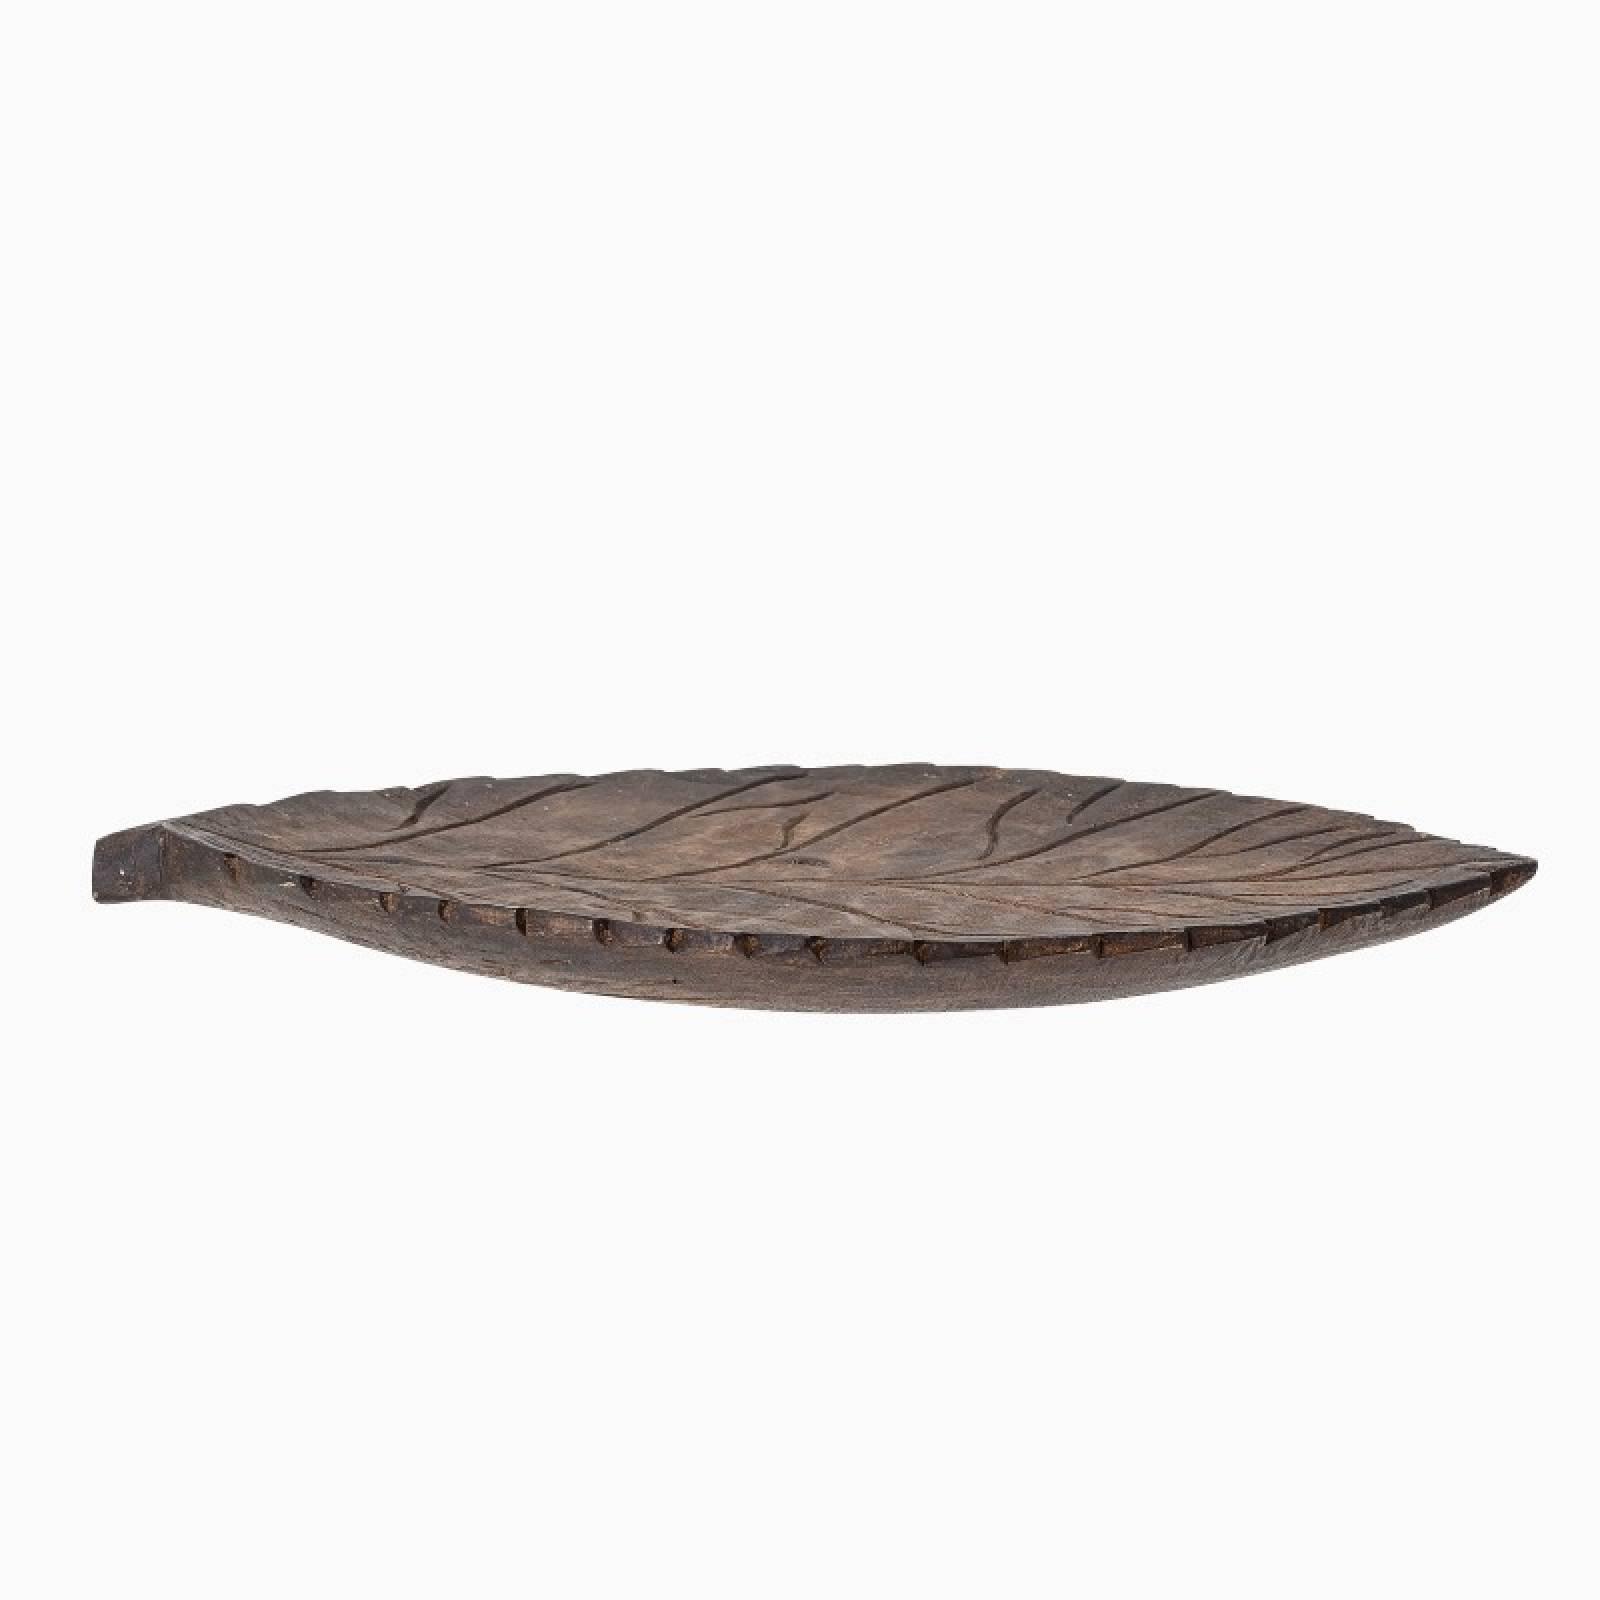 Large Wooden Carved Leaf Shaped Decorative Dish thumbnails